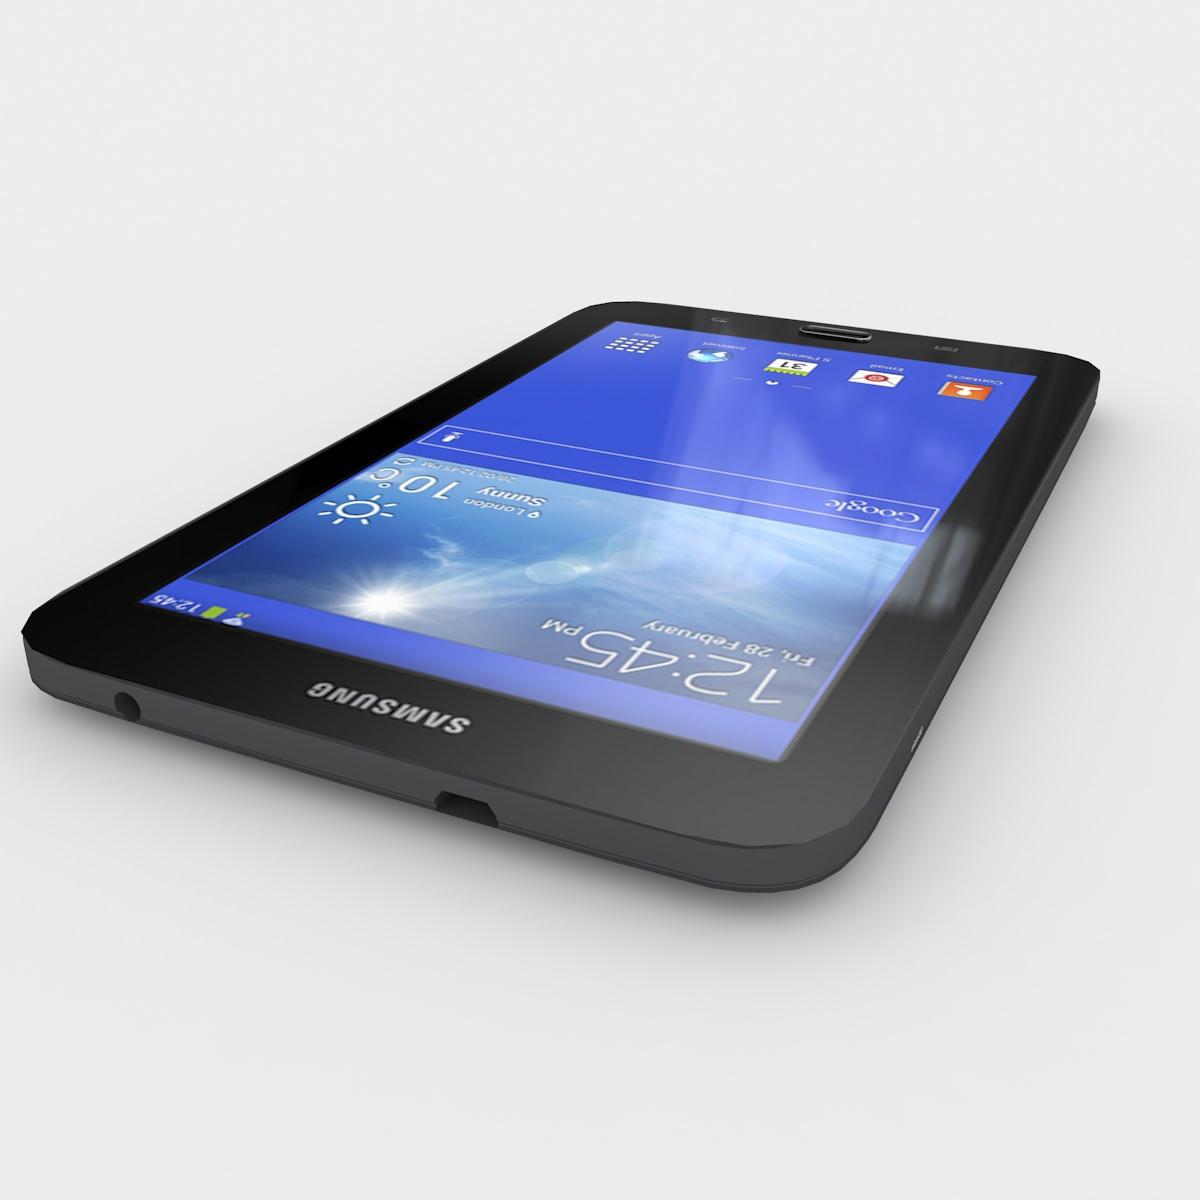 samsung galaxy tab 3 lite 7 0 black 3d model max 3ds fbx lwo lw lws ma mb lxo lxl. Black Bedroom Furniture Sets. Home Design Ideas